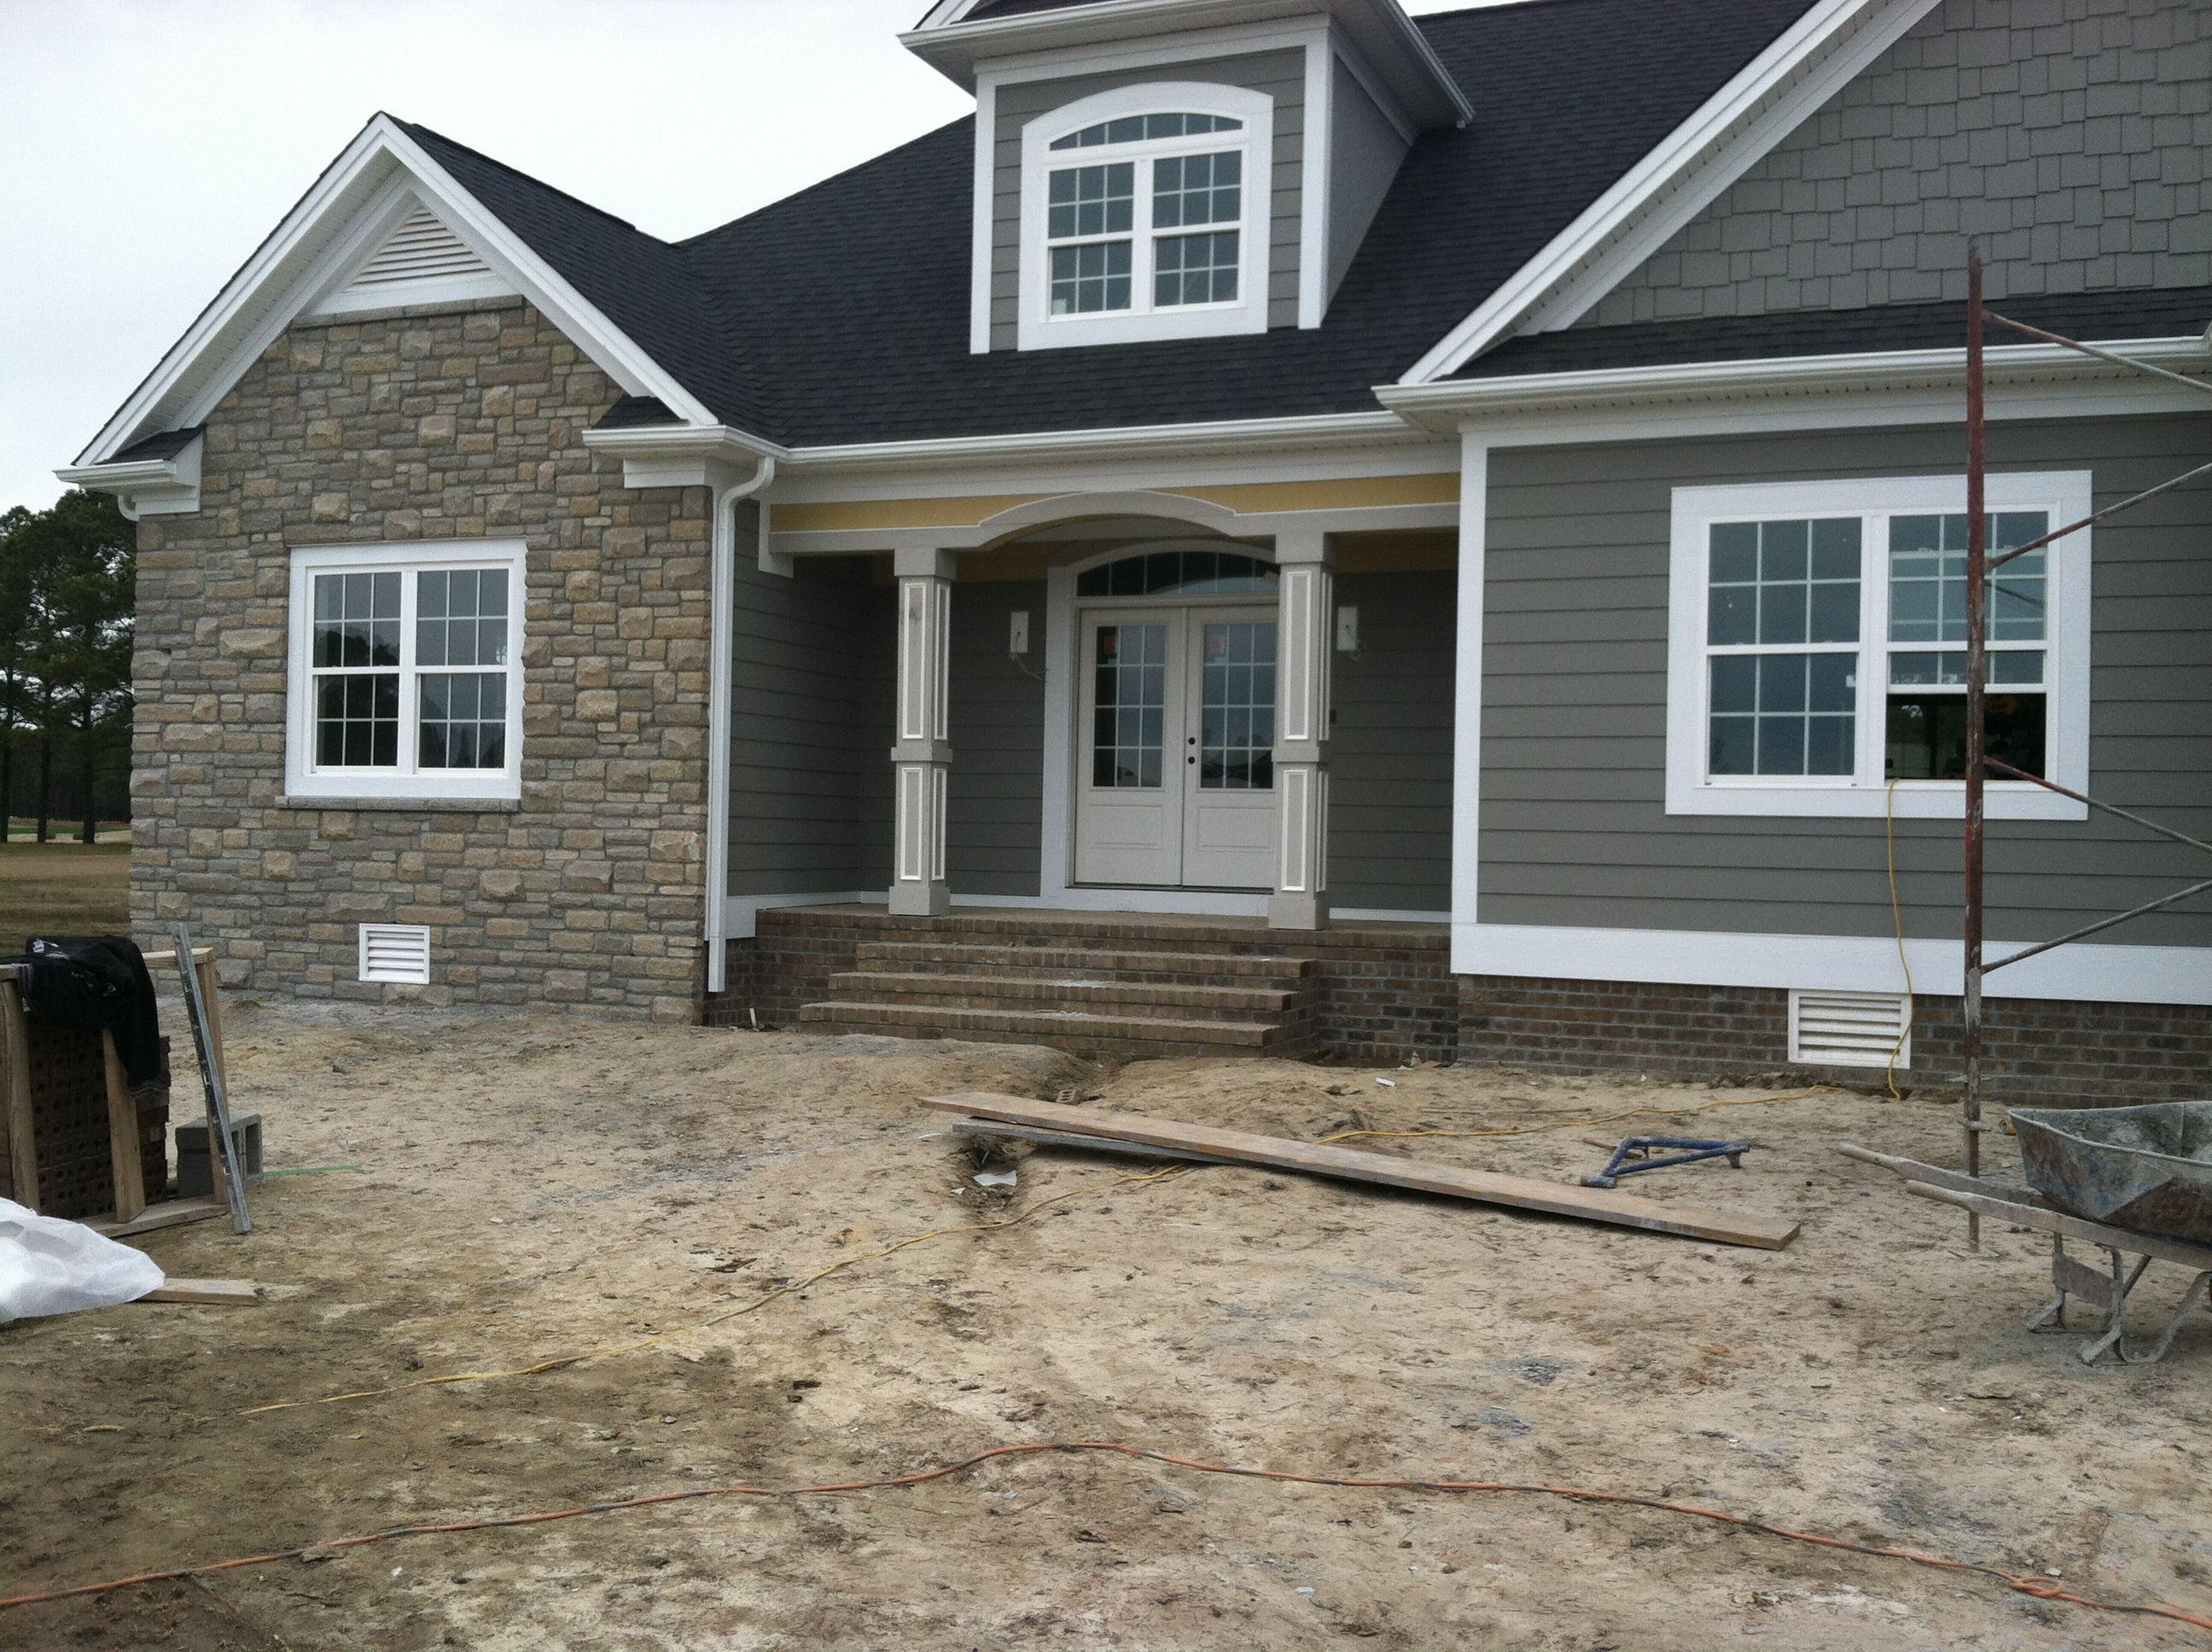 Stone House Front 45degreesdesign